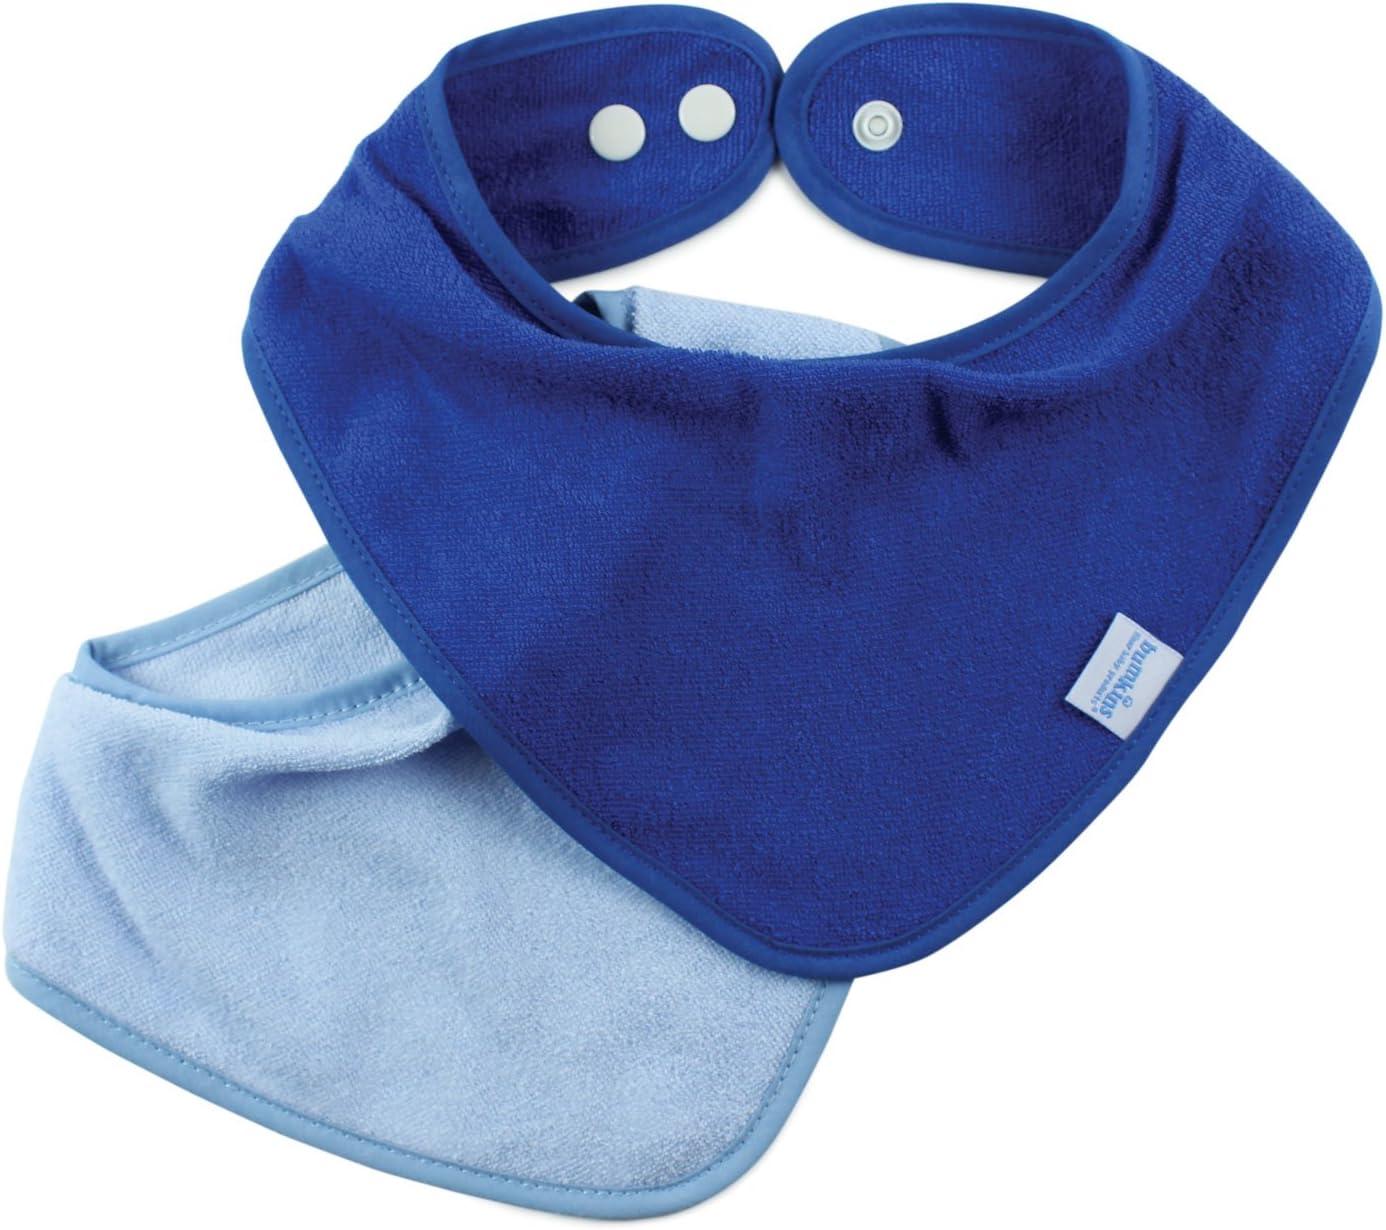 Bumkins 2 Count Absorbent Cotton Bandana Bib Blue